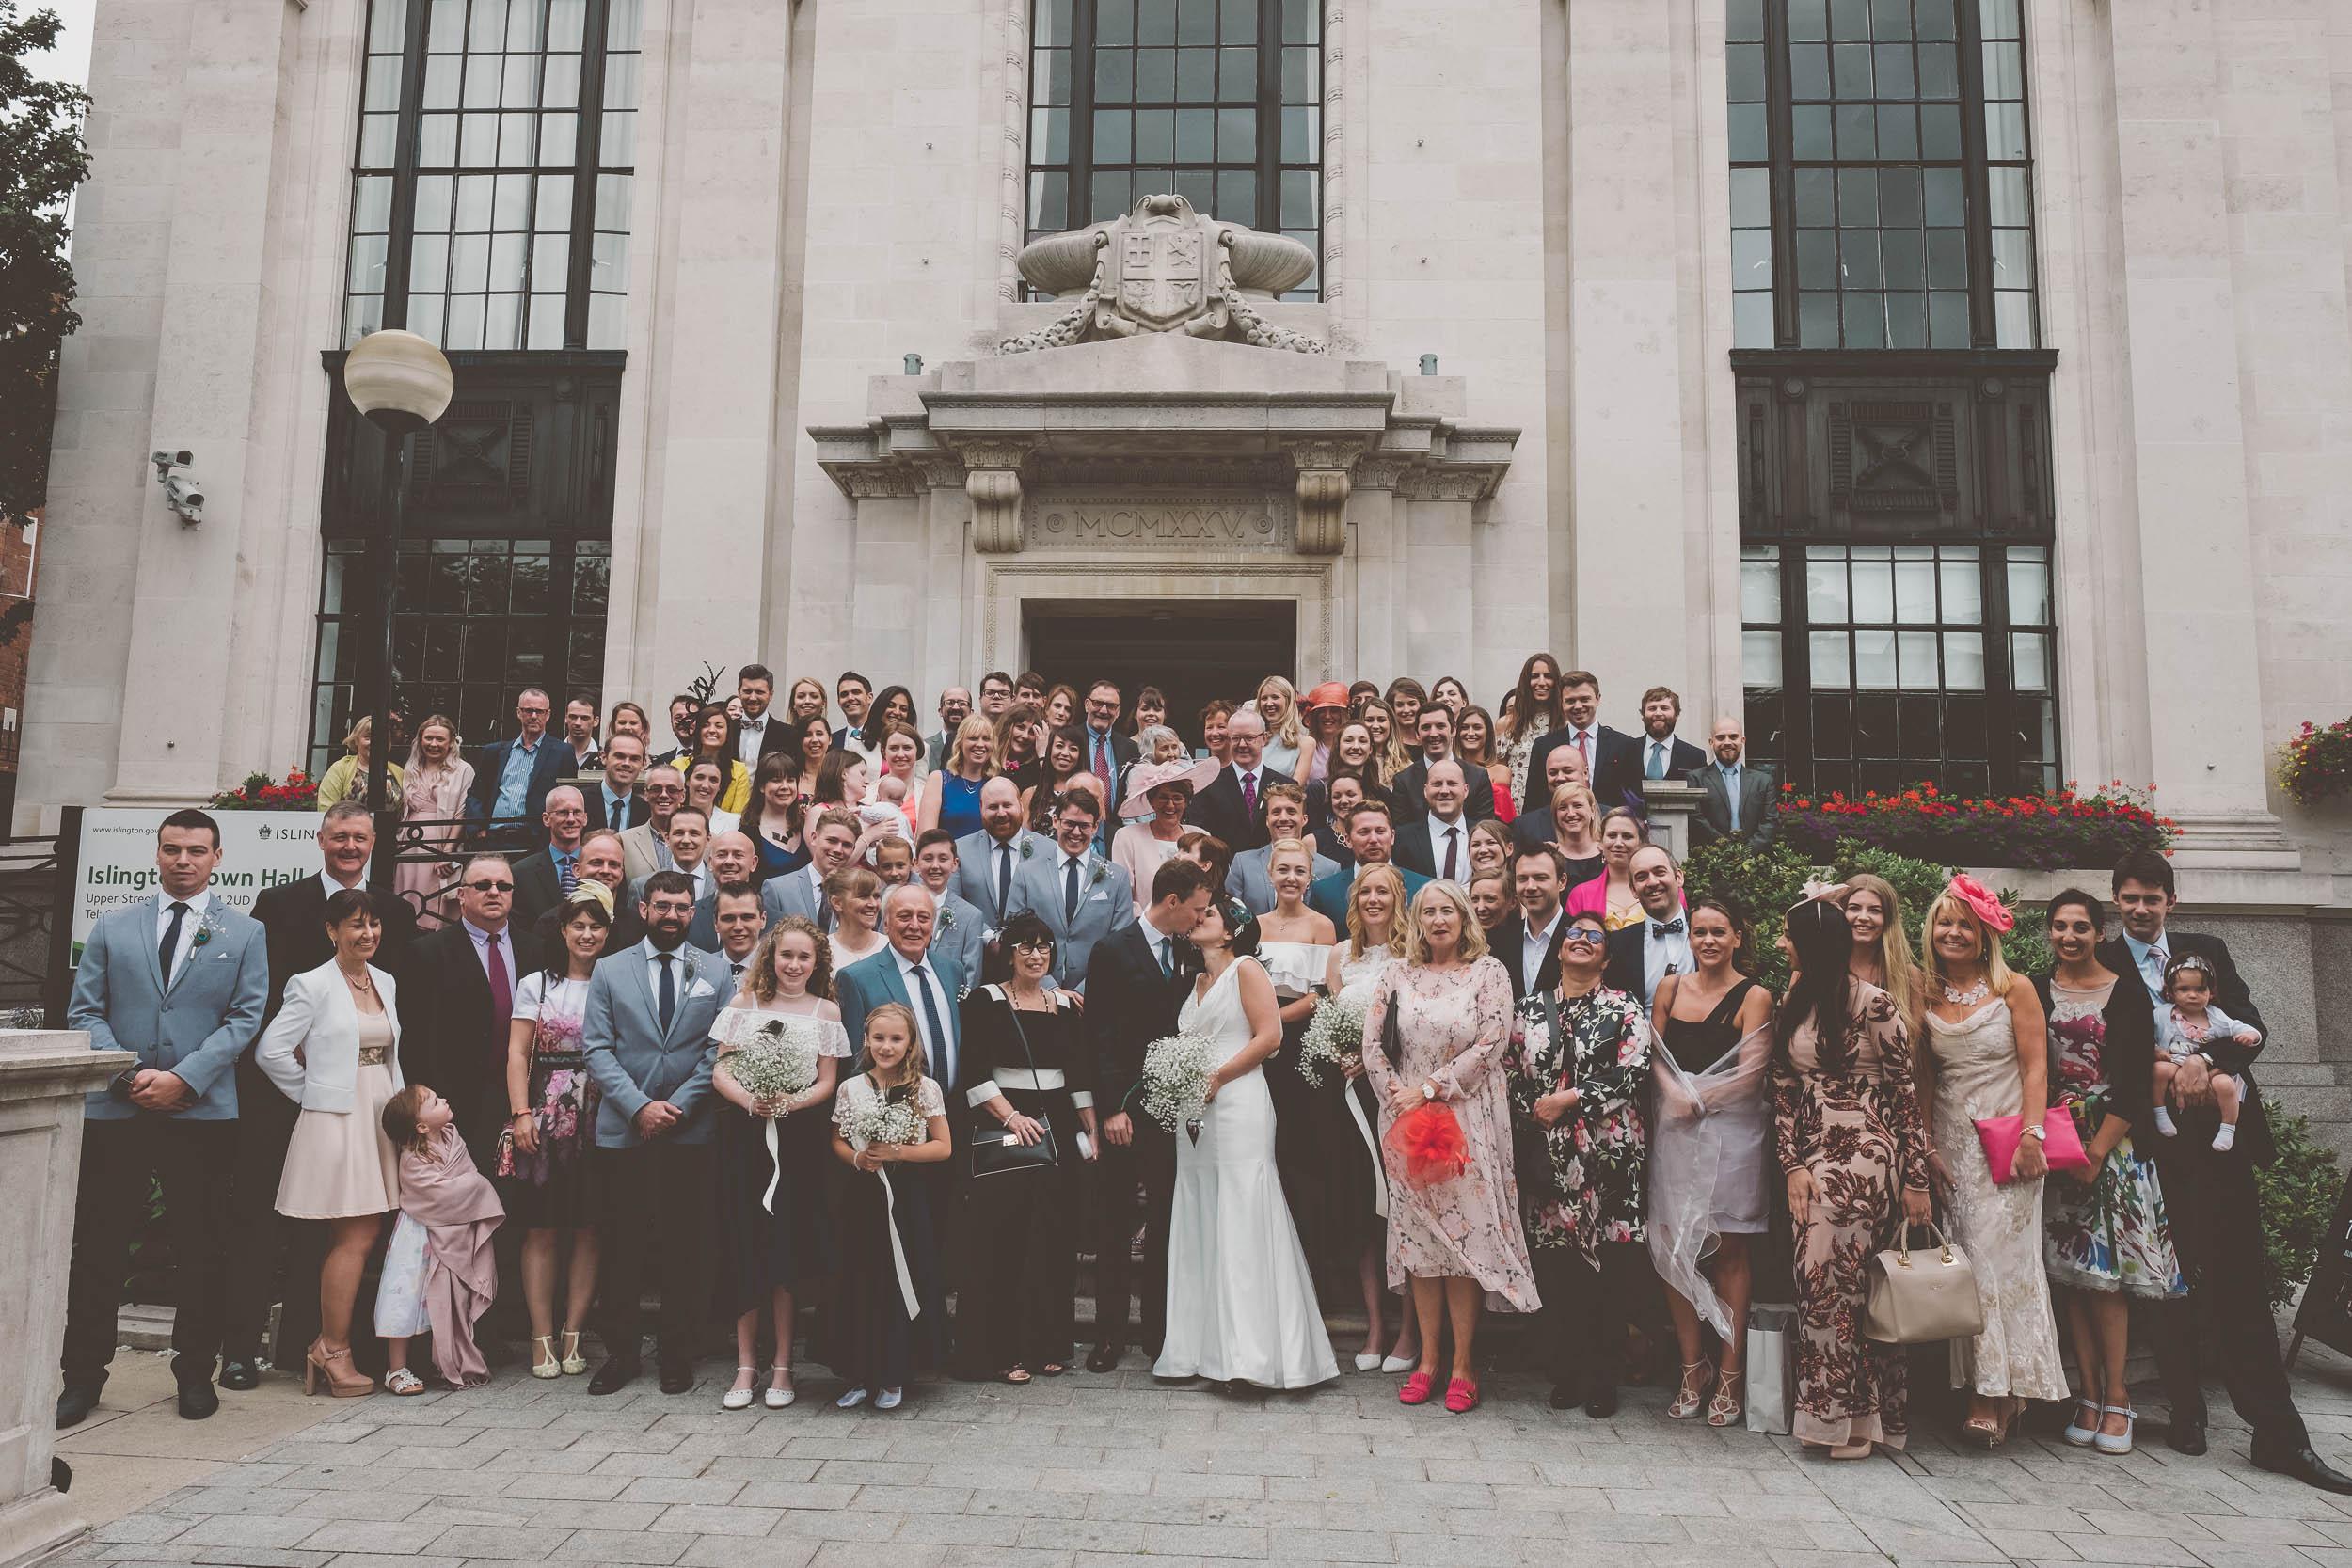 islington-town-hall-4th-floor-studios-wedding171.jpg